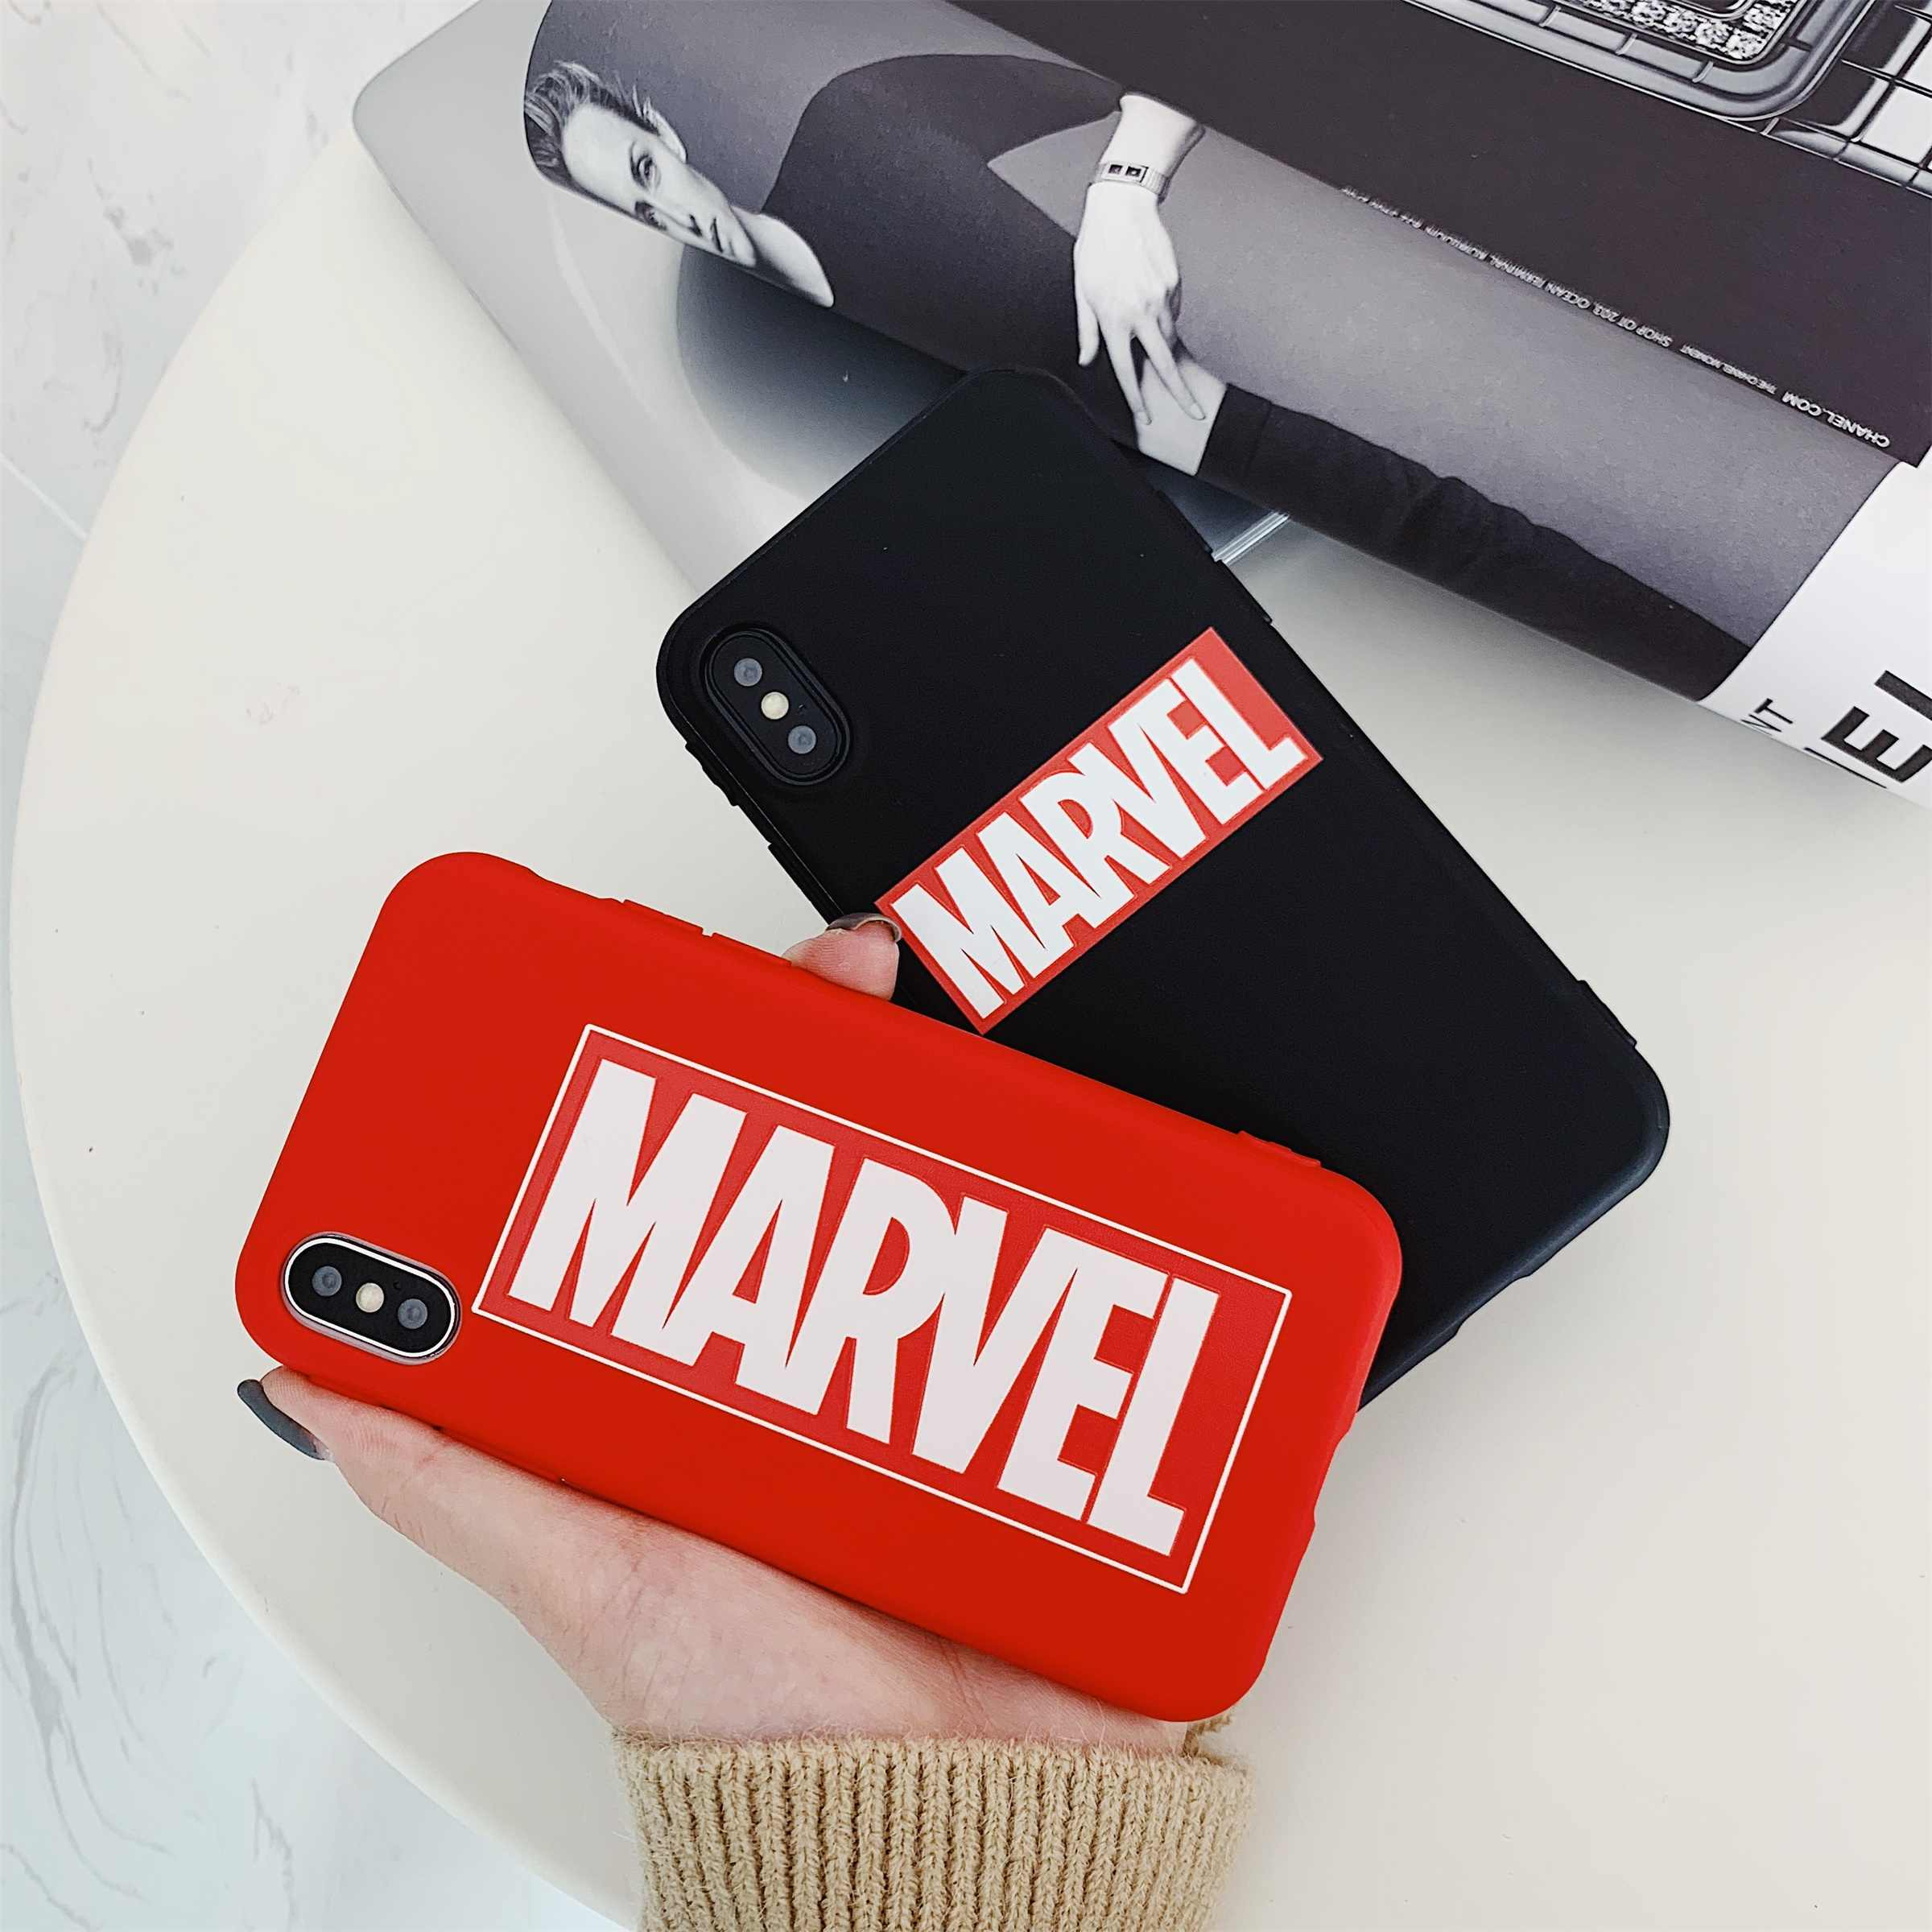 Para iphone X XR XS MAX cubierta para iphone XI 8C 11 6S 6 7 8 Plus América tendencia funda para teléfono móvil marca Marvel con diseño de TPU